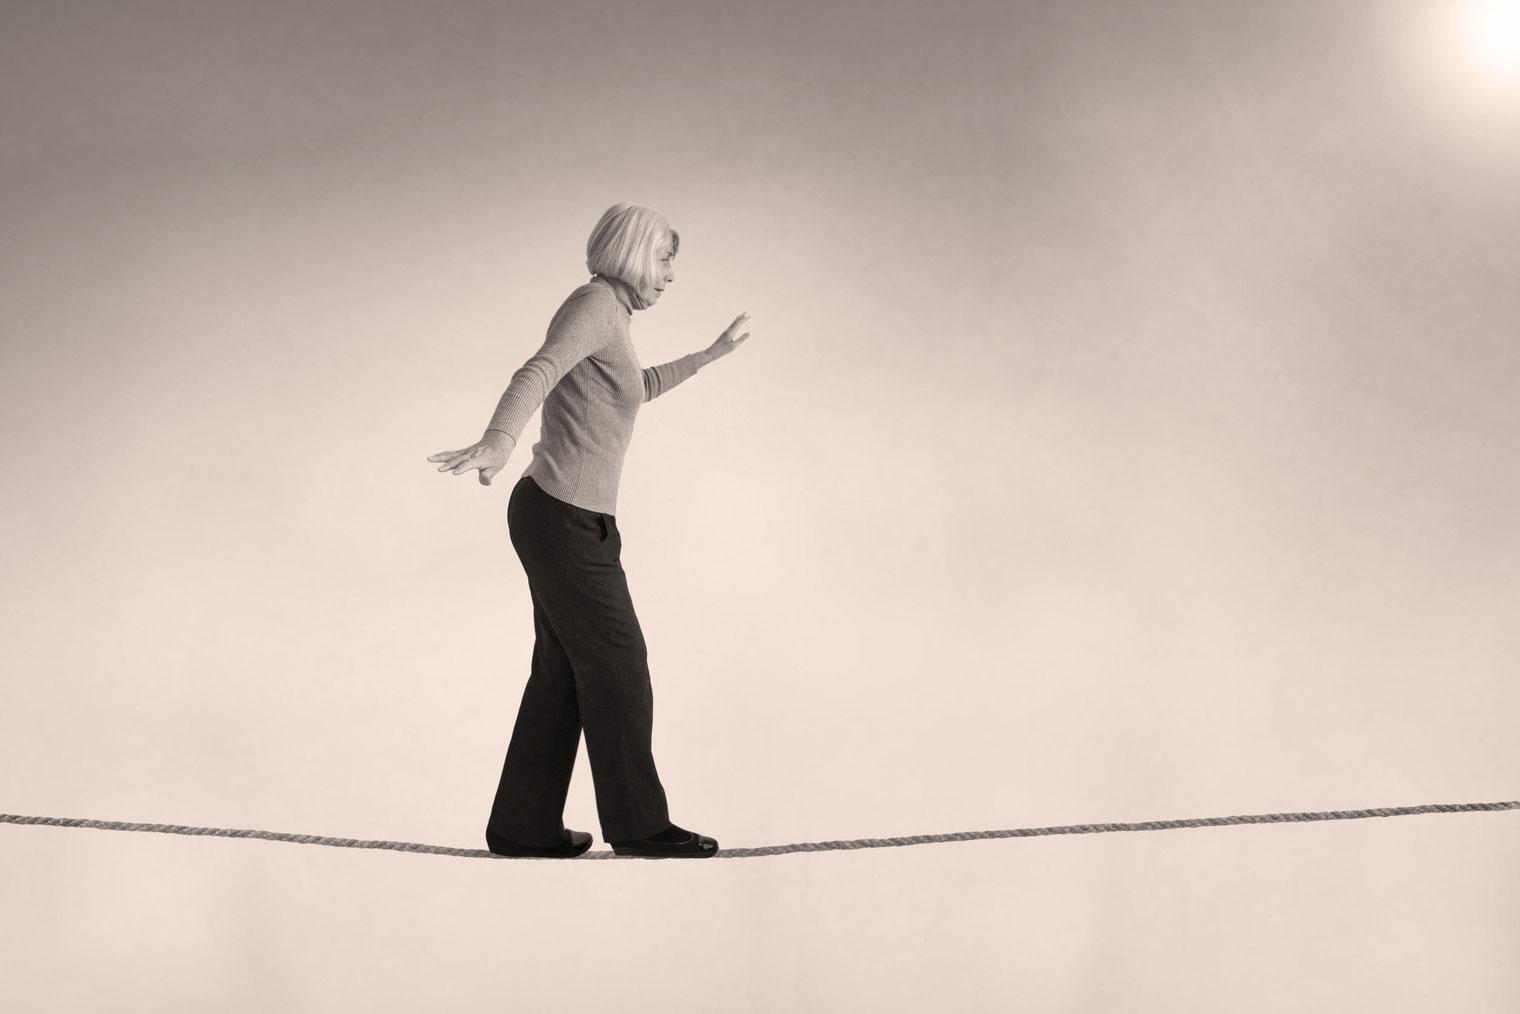 équilibre postural